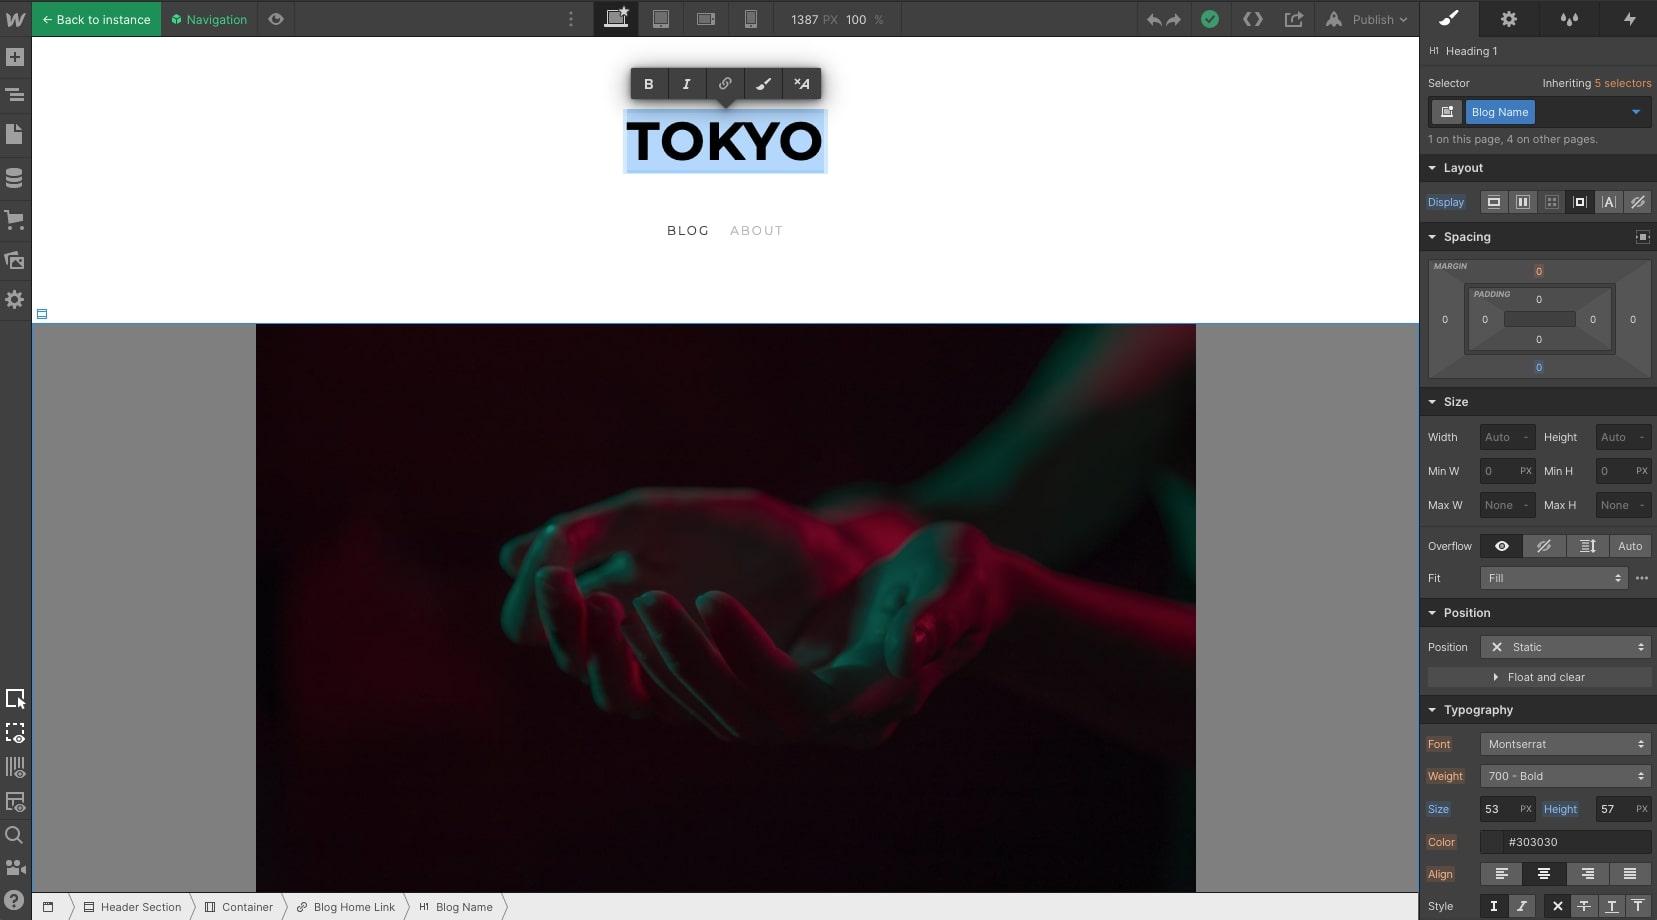 tokyo webflow template